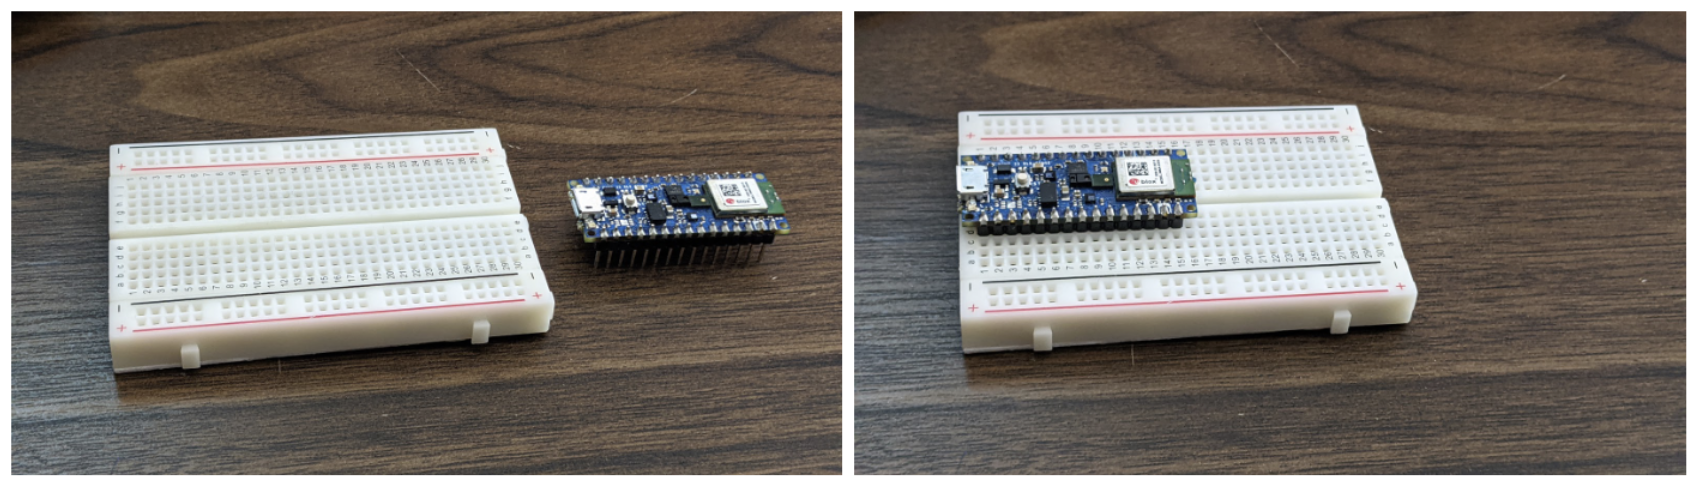 Arduino Nano 33 BLE Sense board with headers inserted into a solderless breadboard.